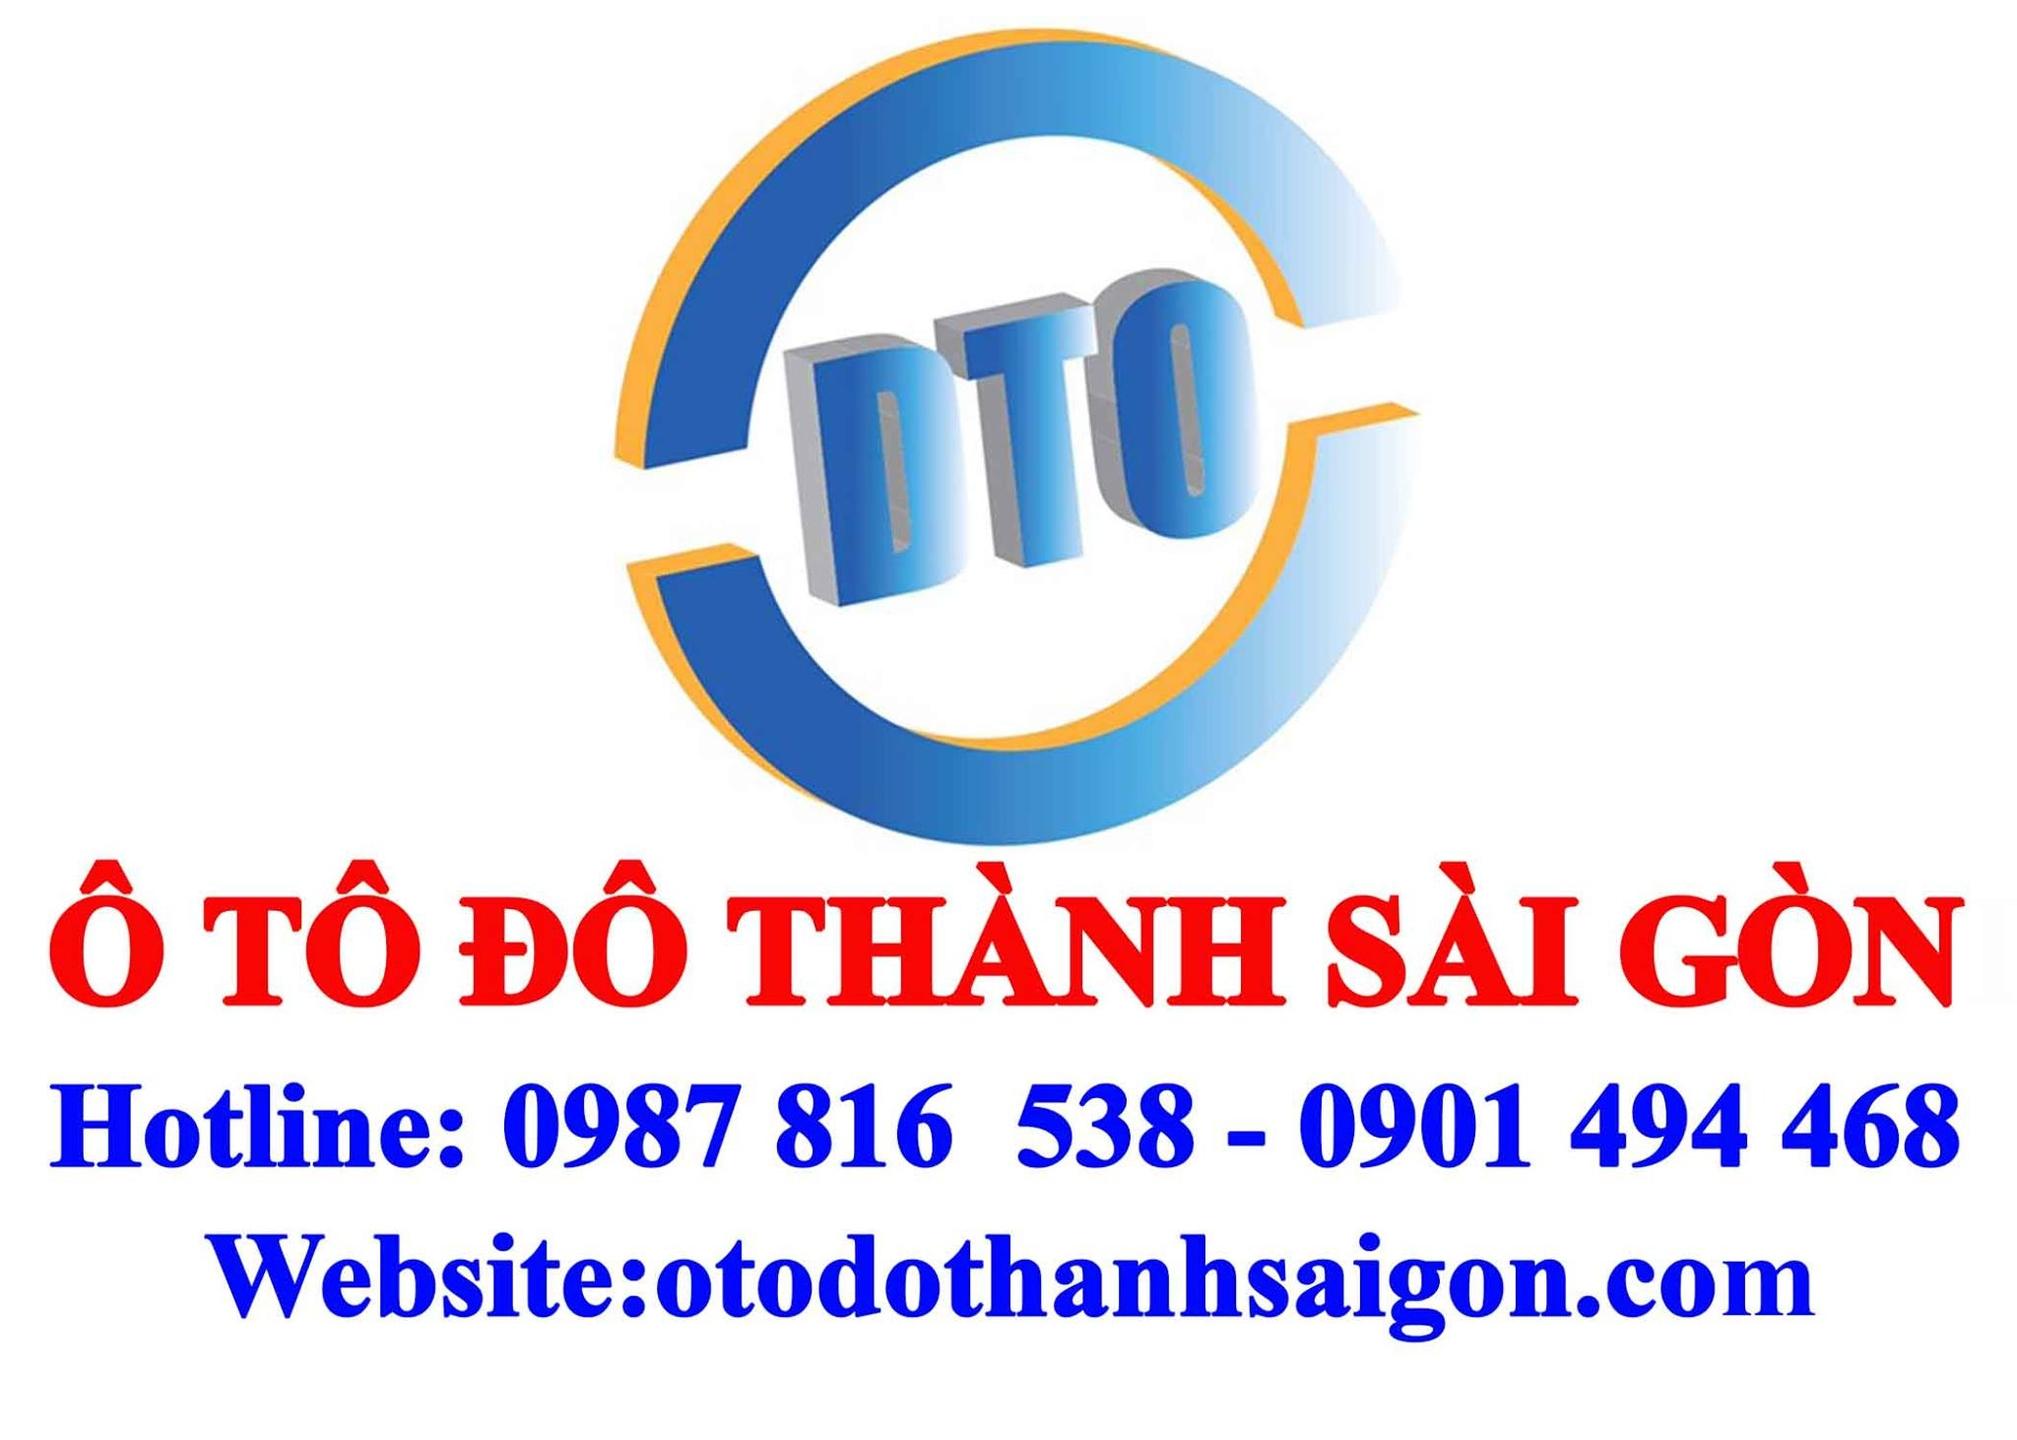 otodothanhsaigon (@otodothanhsaigon) Cover Image